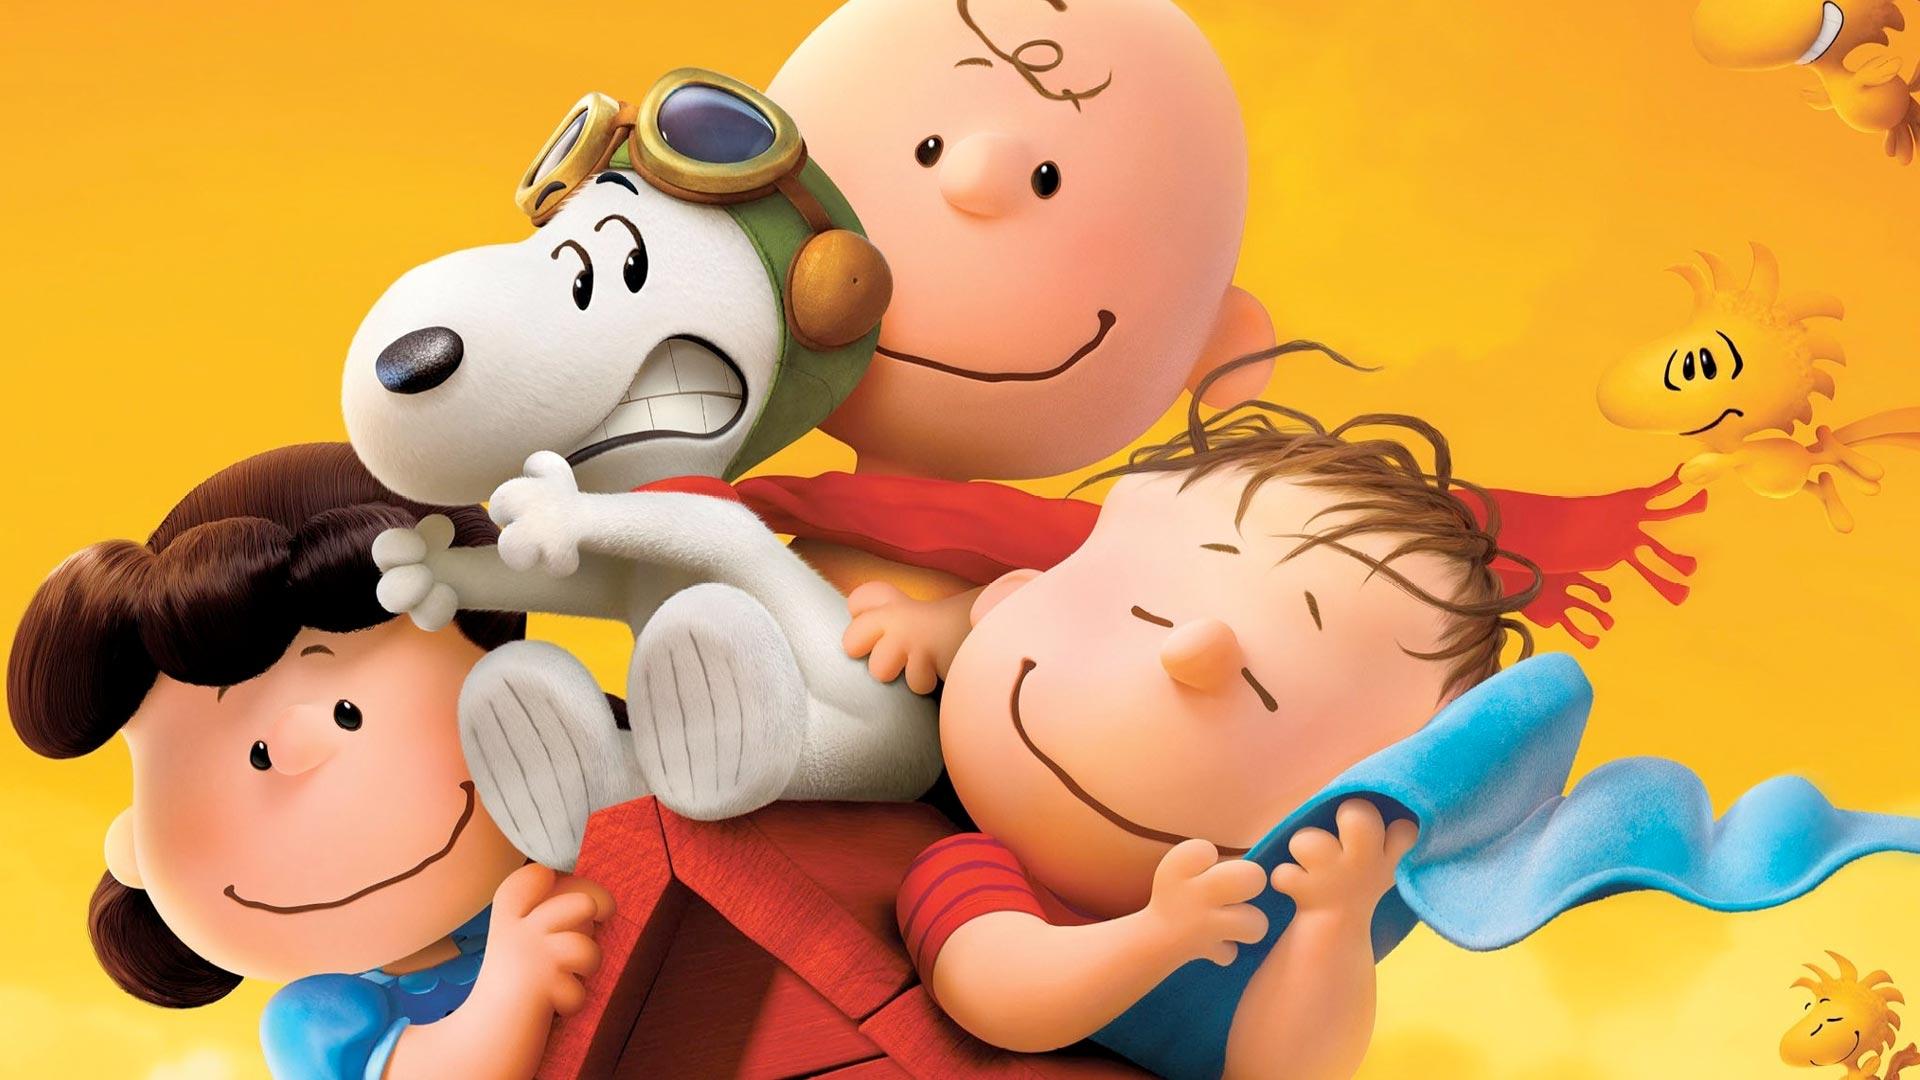 Est100 ĸ�些攝影 Some Photos The Peanuts Movie ŏ�努比